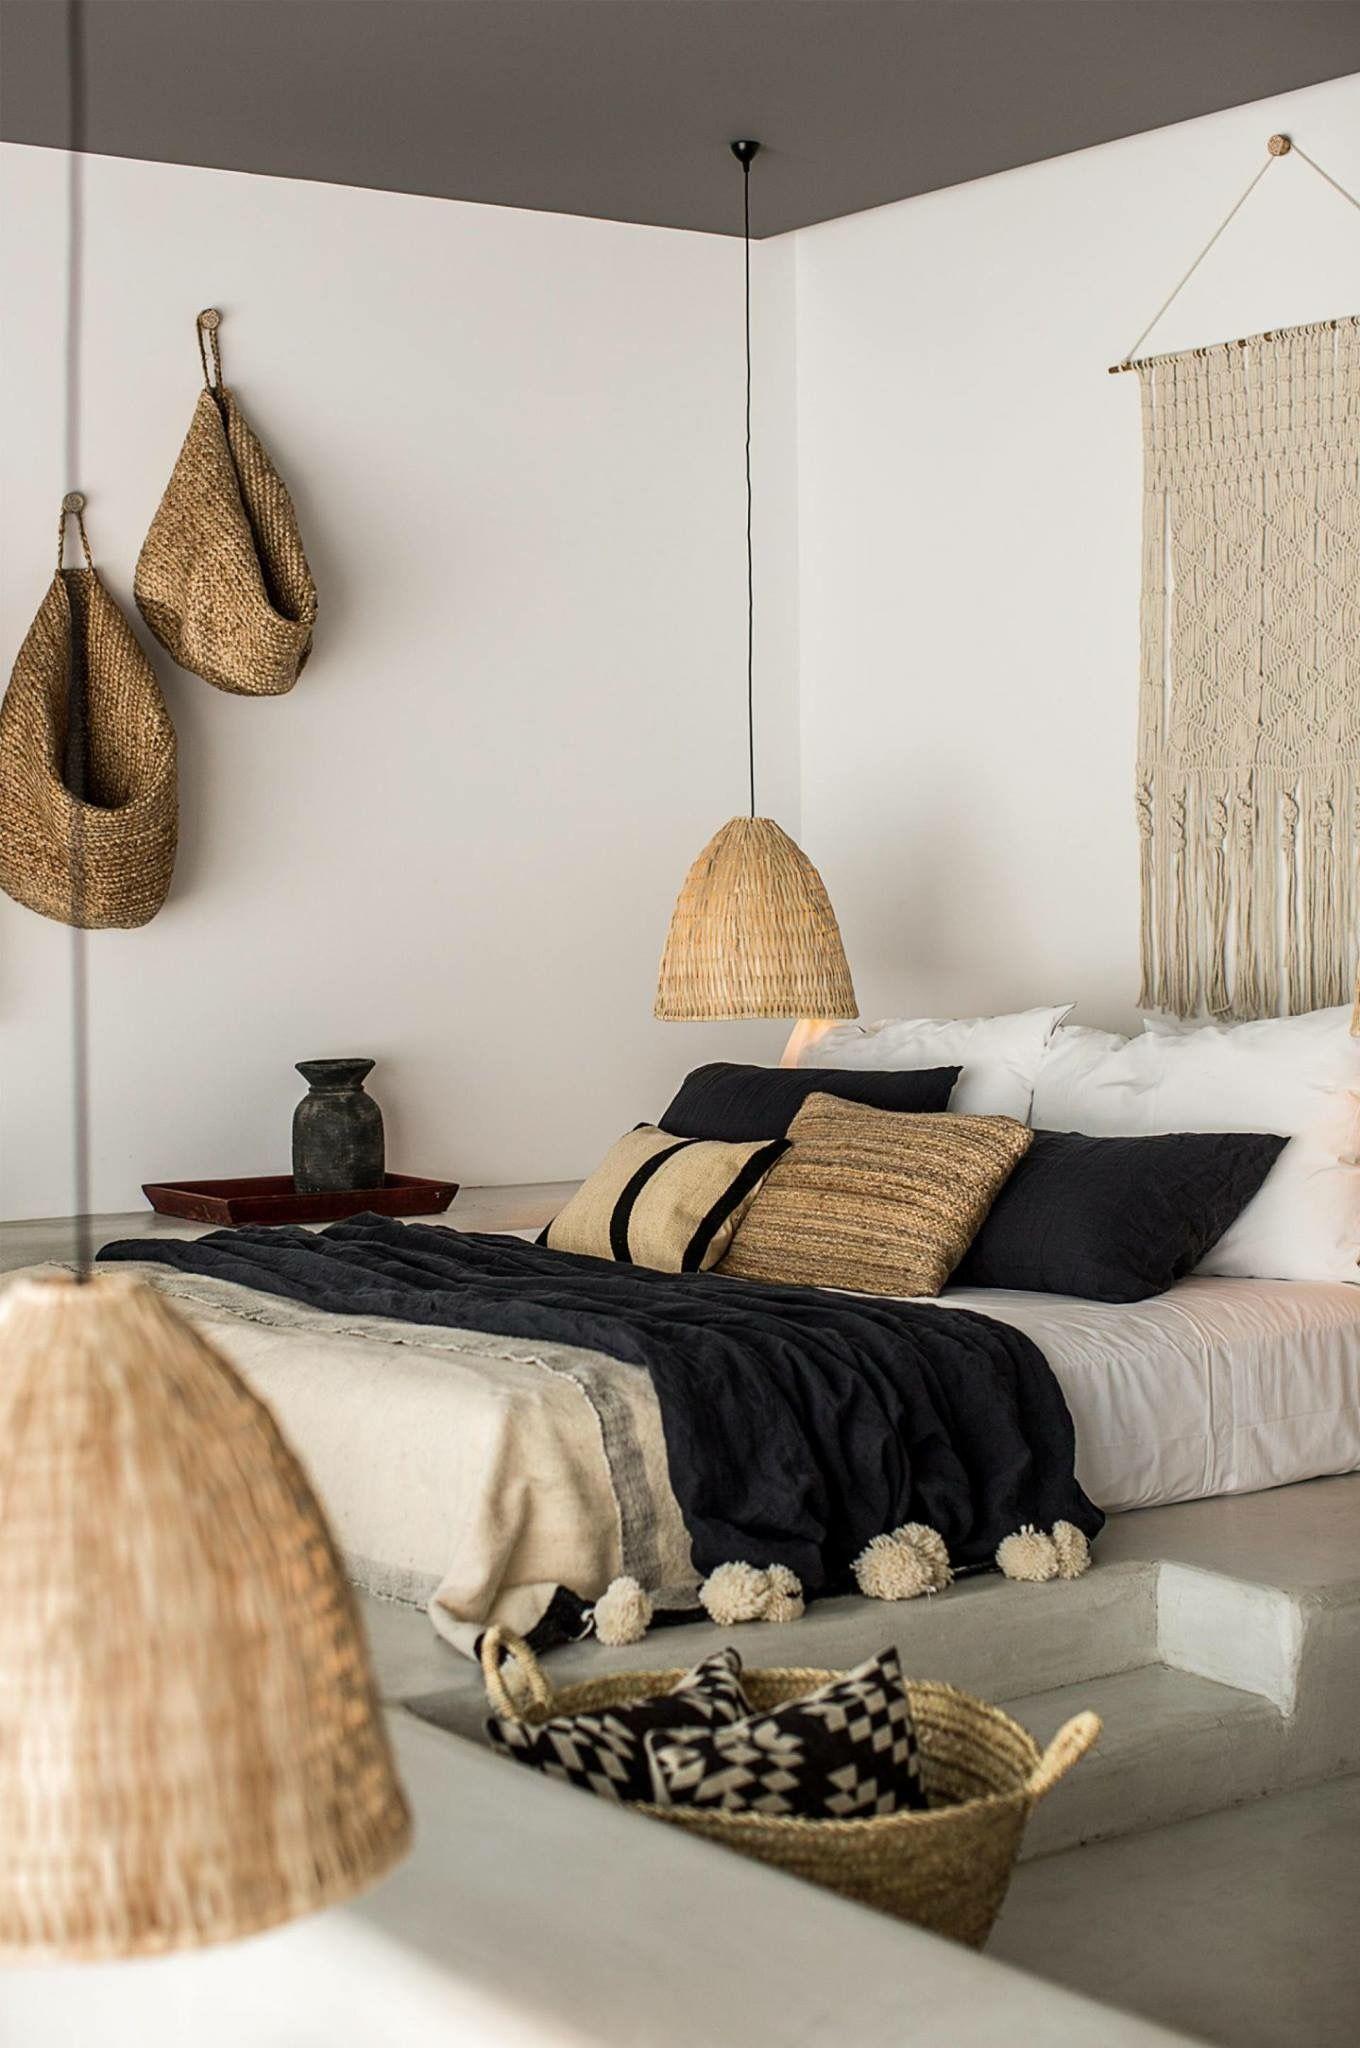 Room decor. Pin by Sharon O Callaghan on Riebeek Kasteel   Pinterest   Neutral